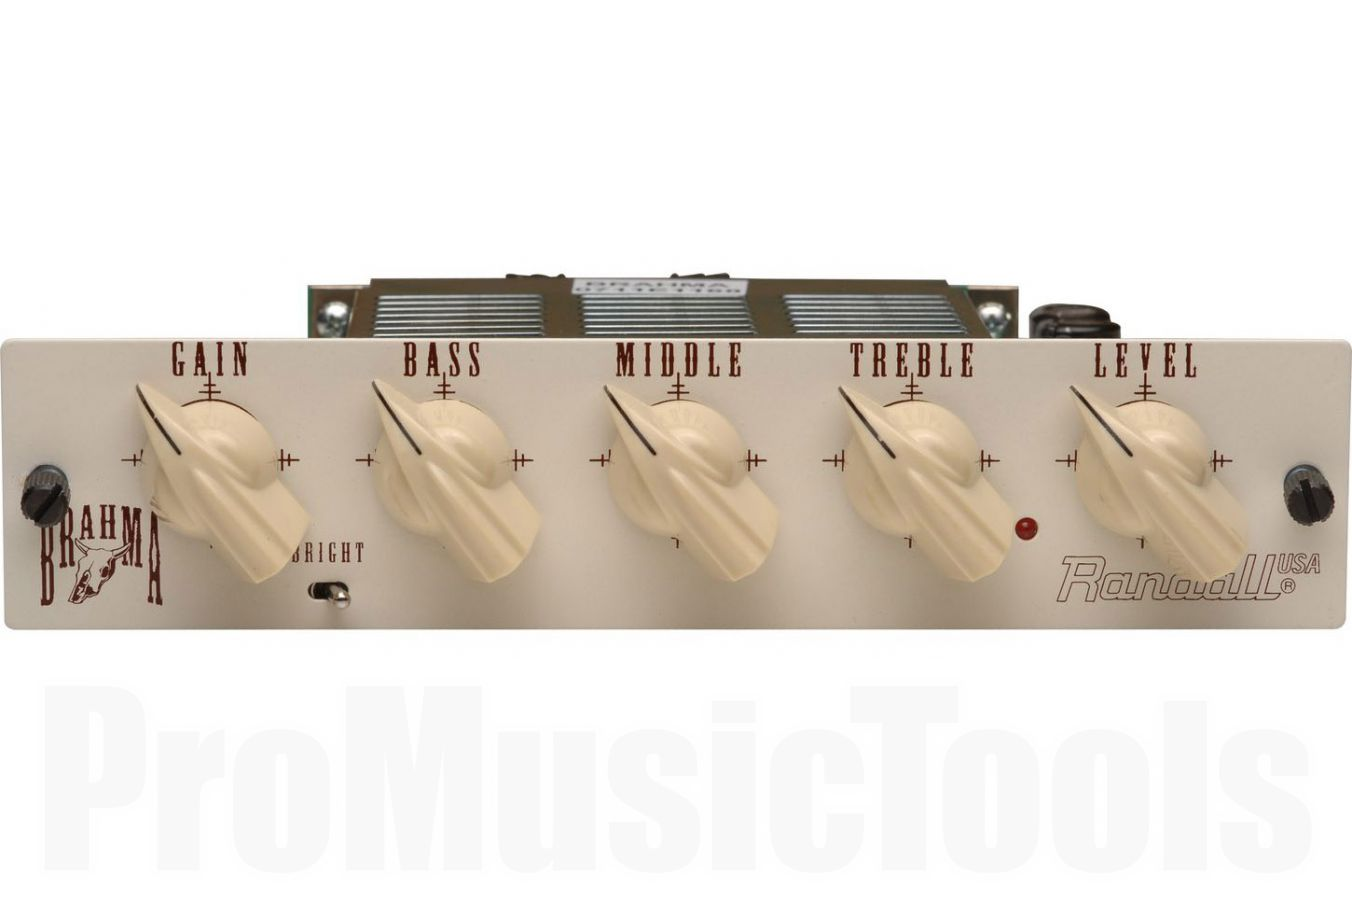 Randall USA MTS Brahma - George Lynch signature guitar amp module